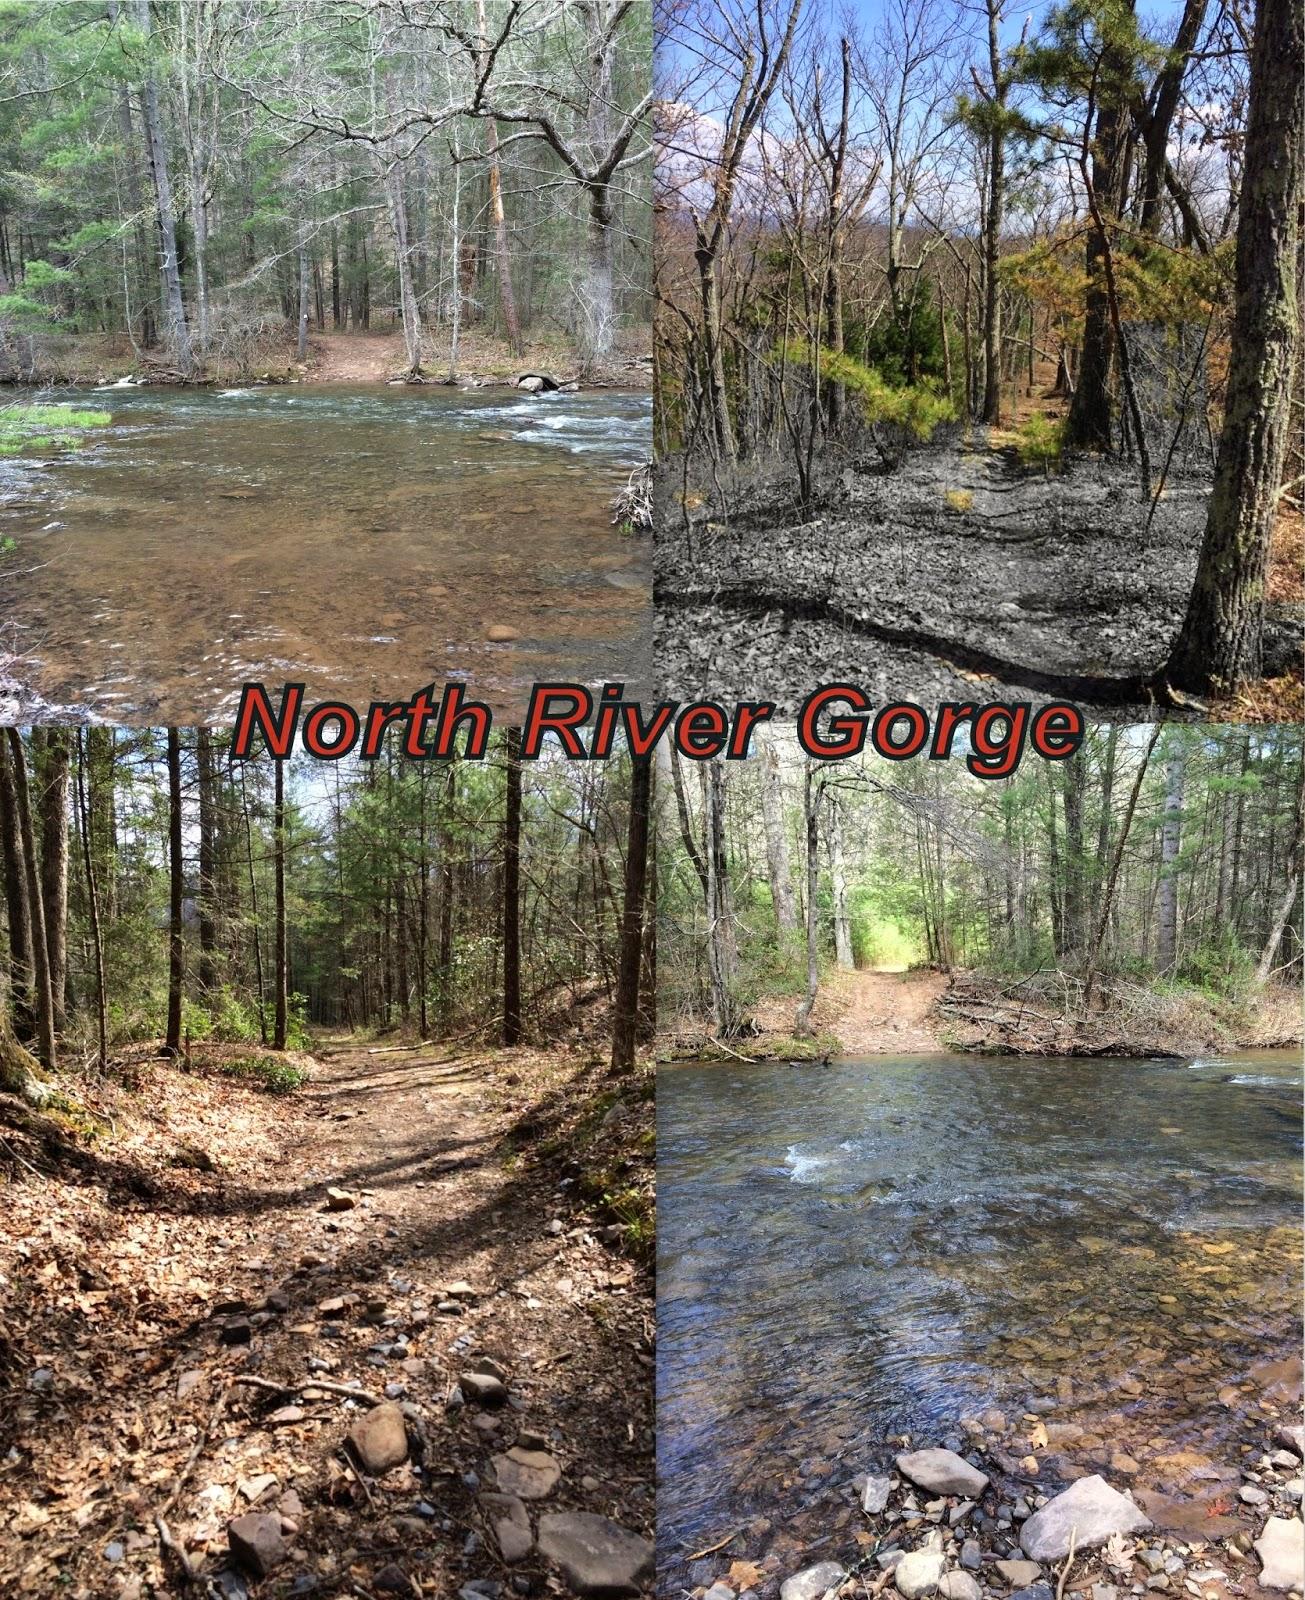 North River Gorge Hike